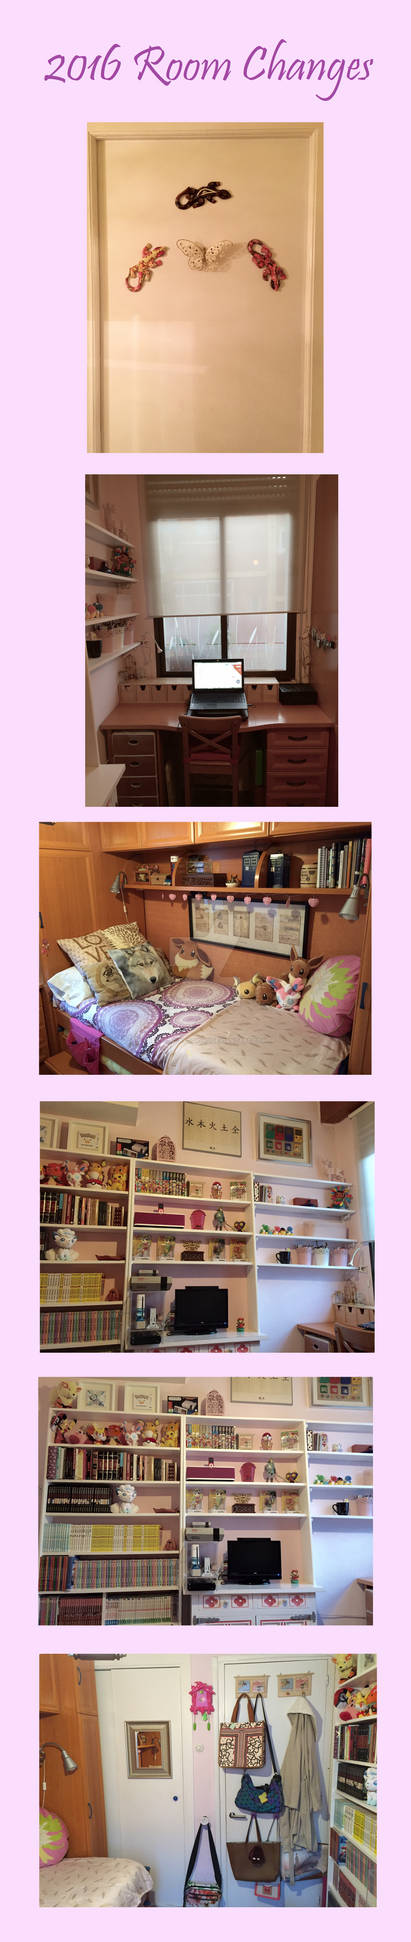 Room changes